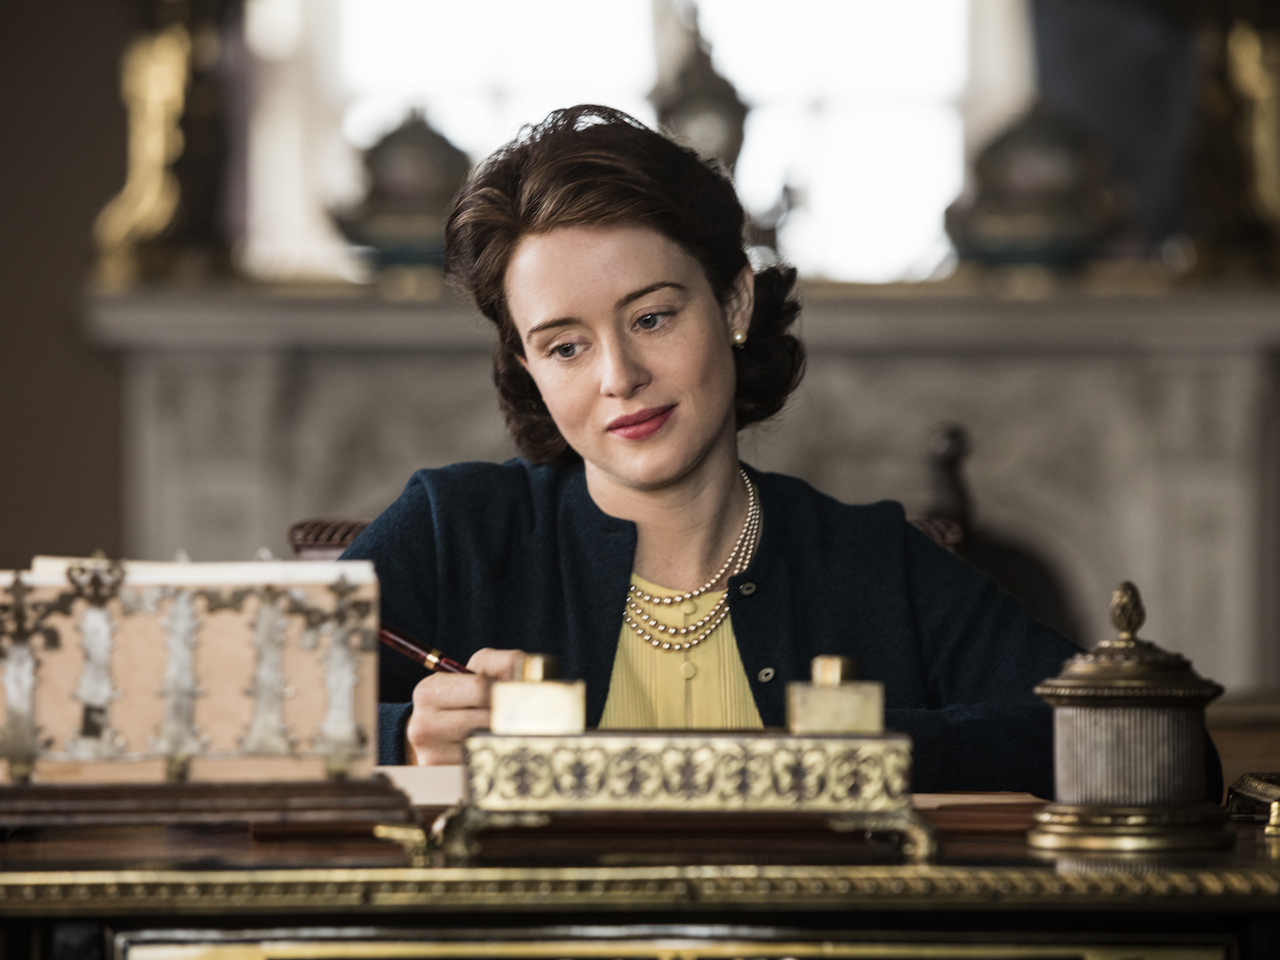 The Crown season 2 royals - Elizabeth writes a note to Philip